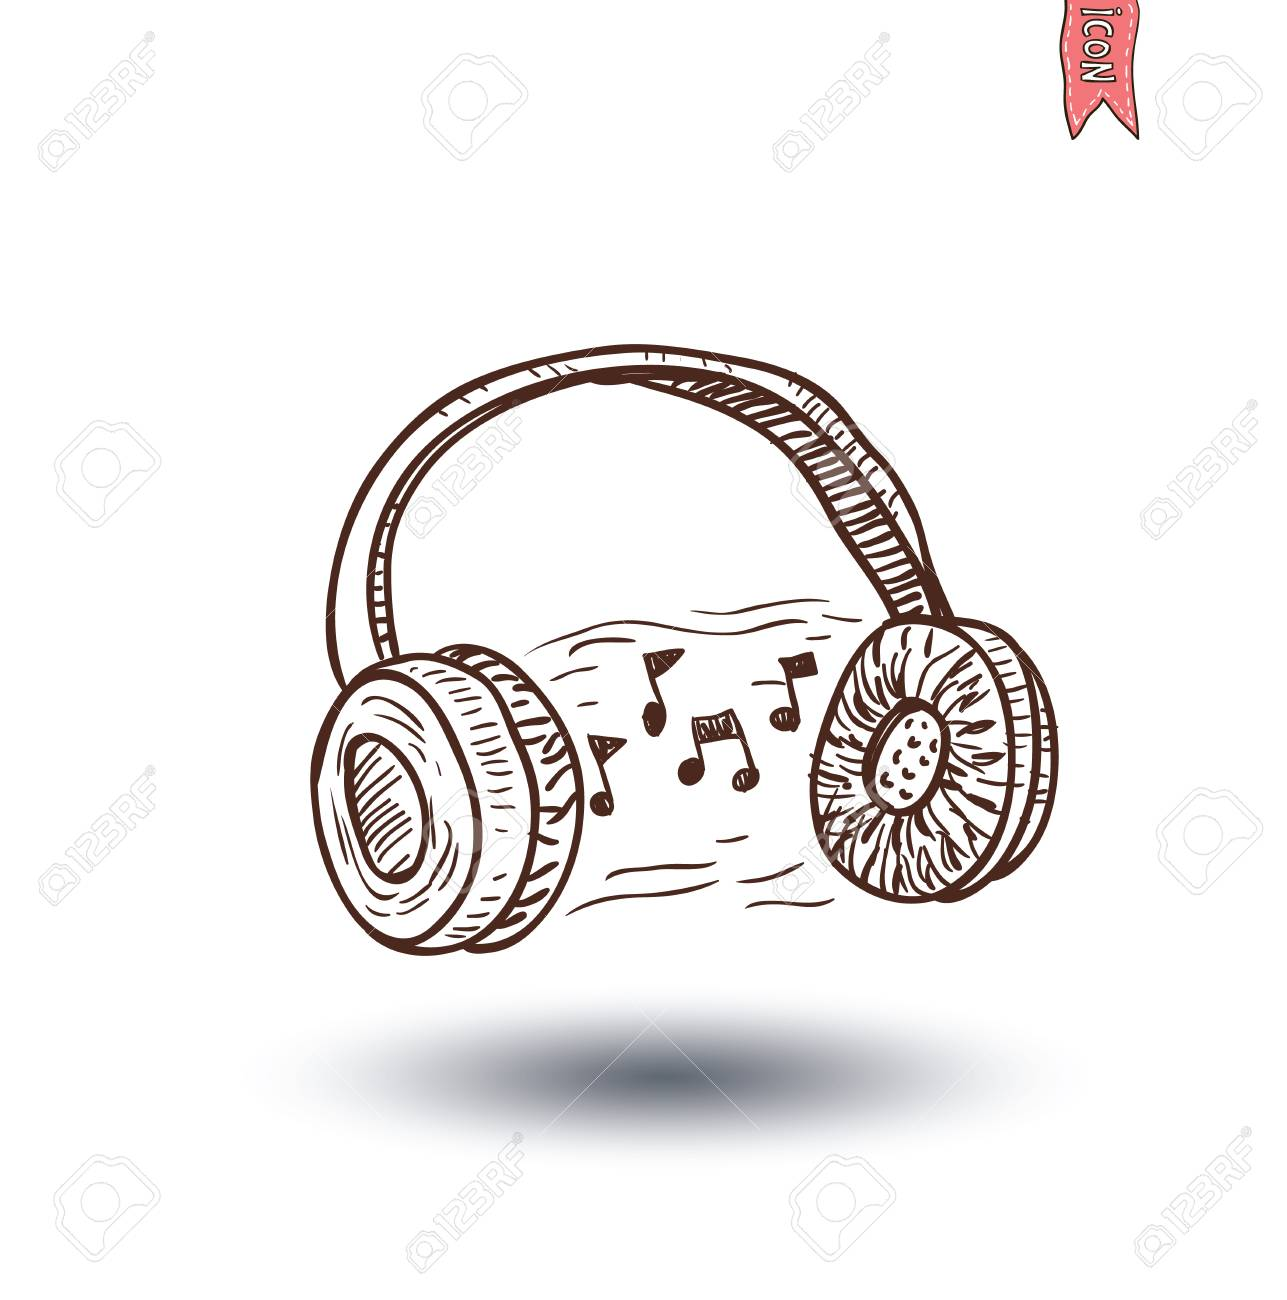 1287x1300 Headphone And Beats, Hand Drawn Illustration. Royalty Free